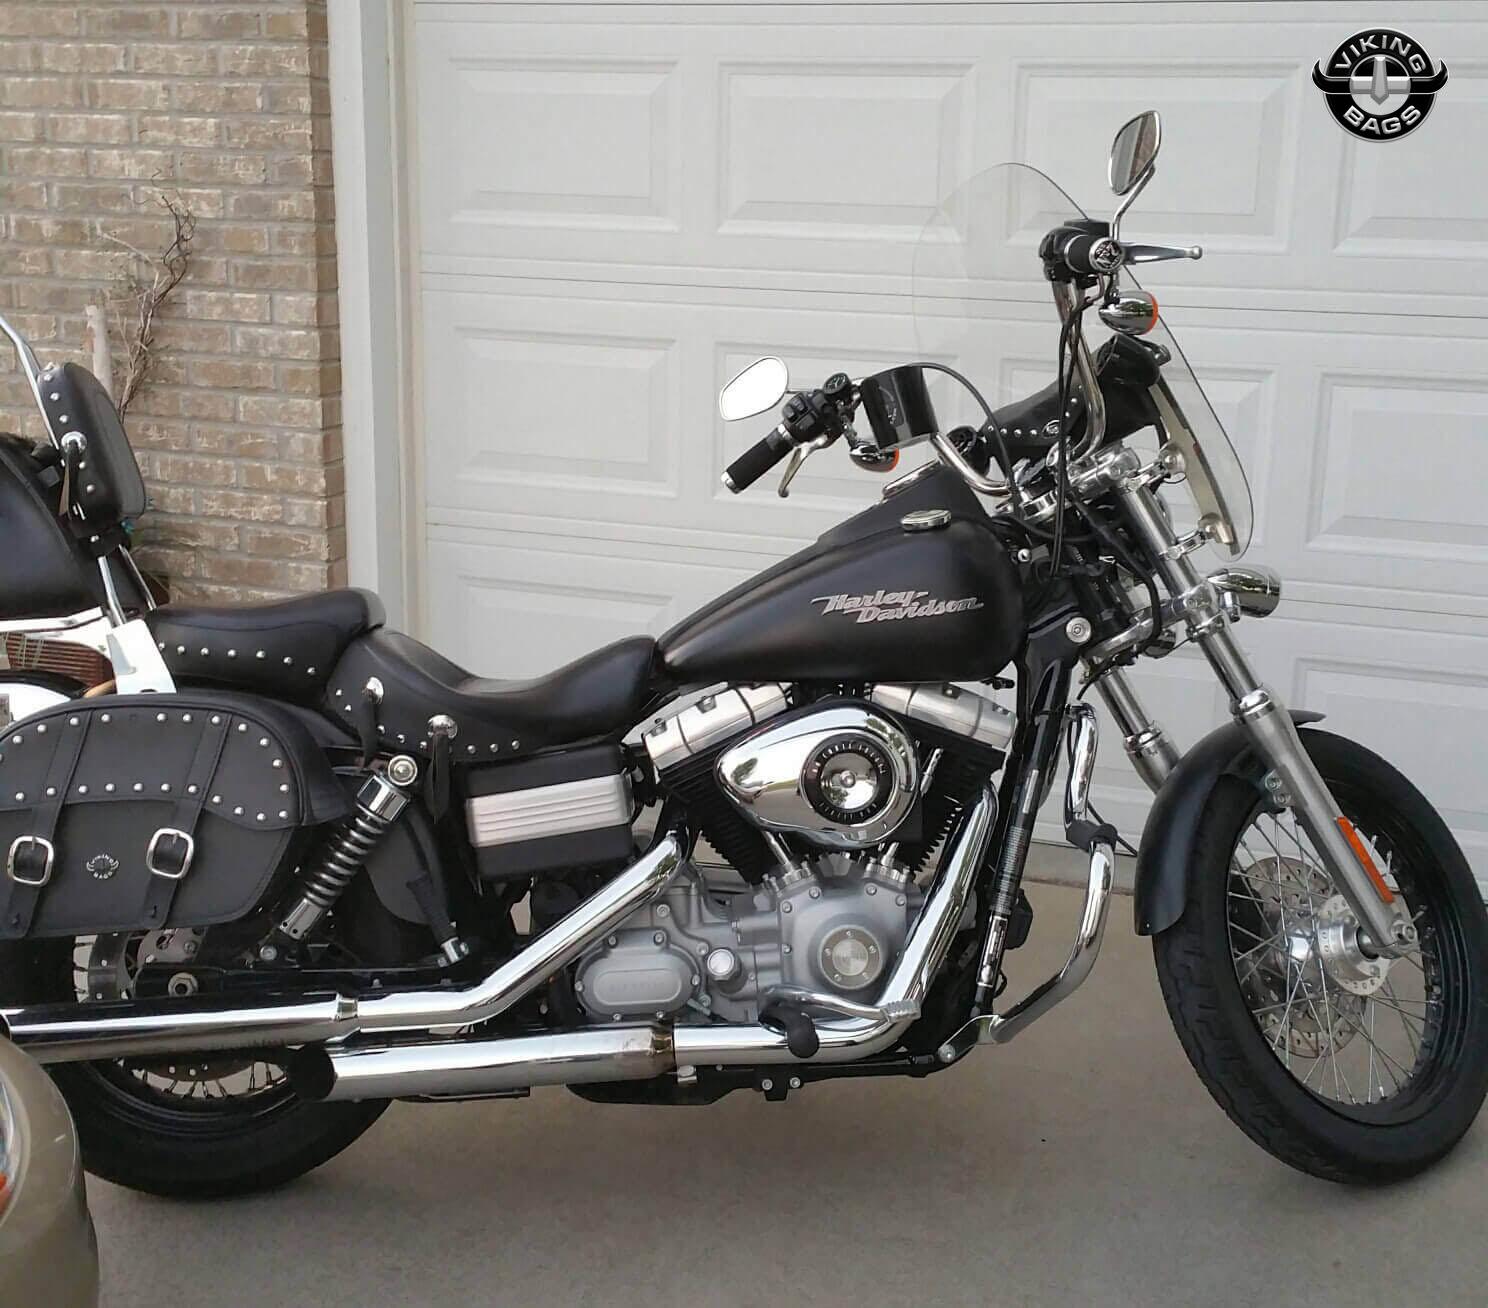 harley davidson dyna motorcycle saddlebags viking bags